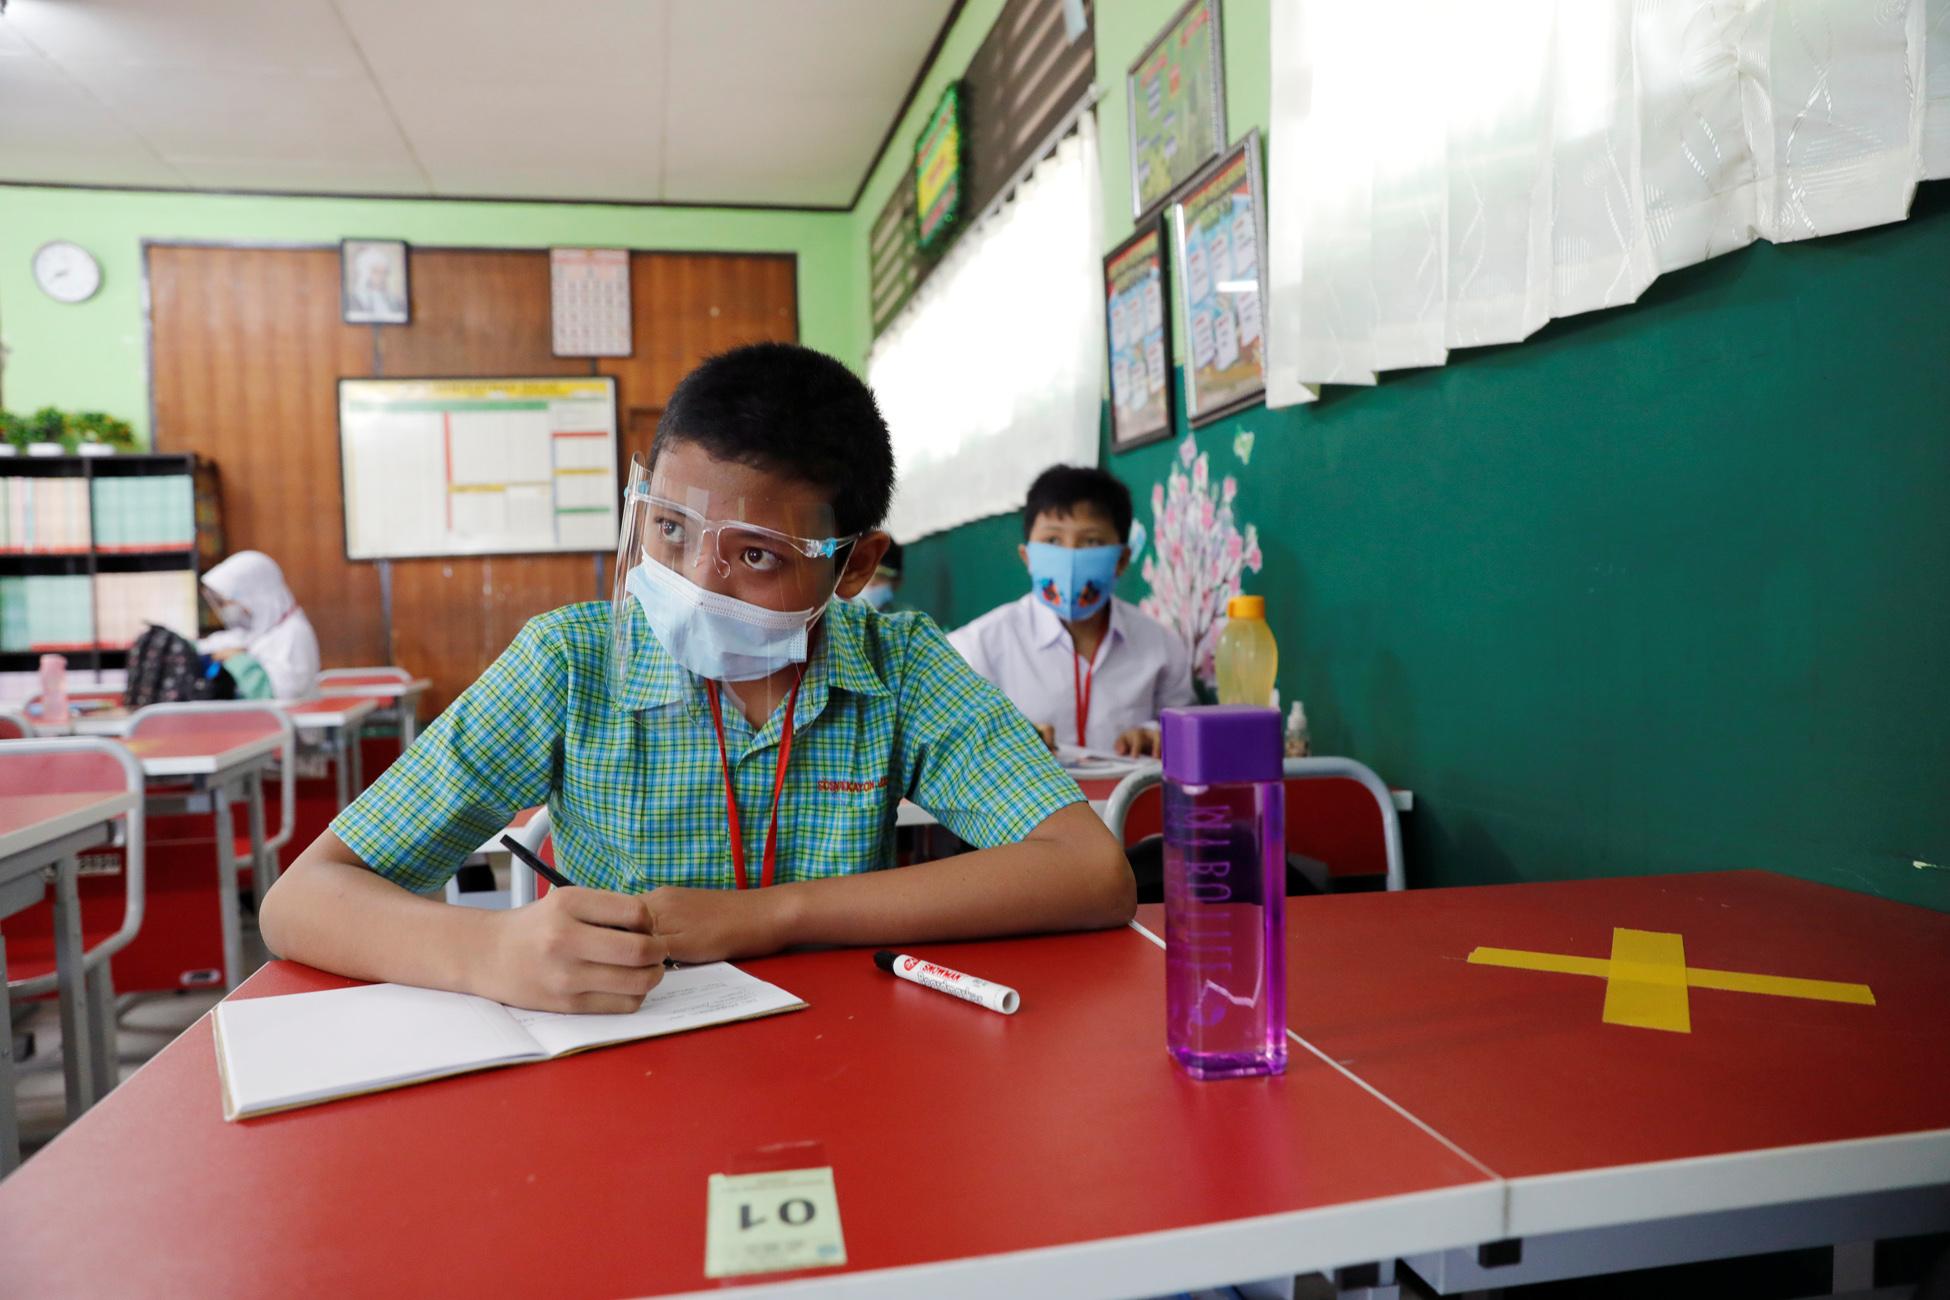 UNESCO: Προβλήματα στη μάθηση και «καταστροφές γενεών» λόγω κορονοϊού